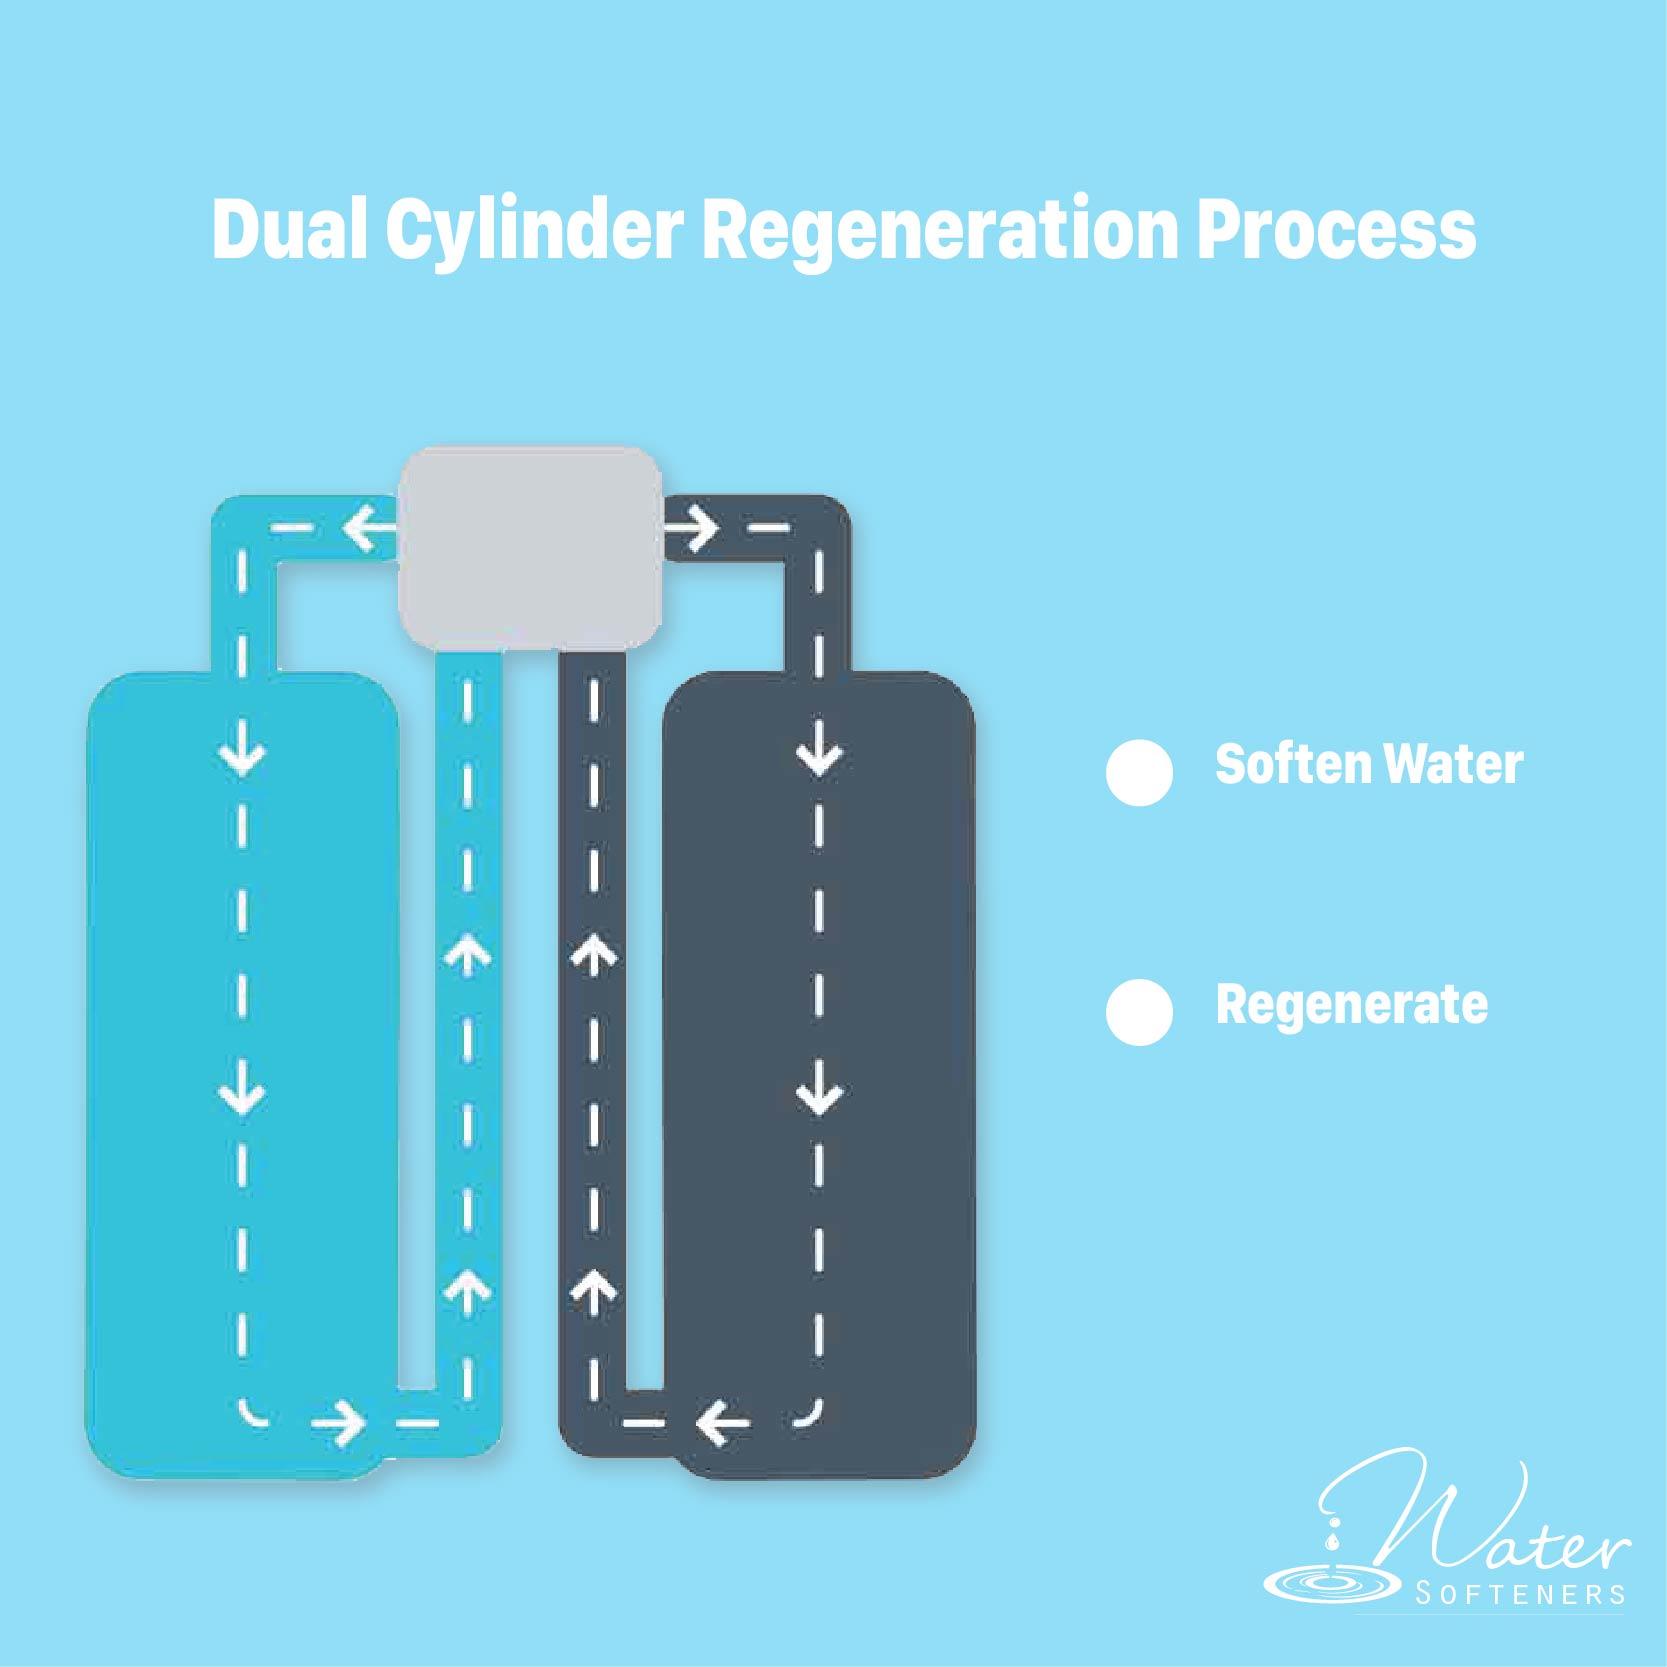 The dual cylinder regeneration process